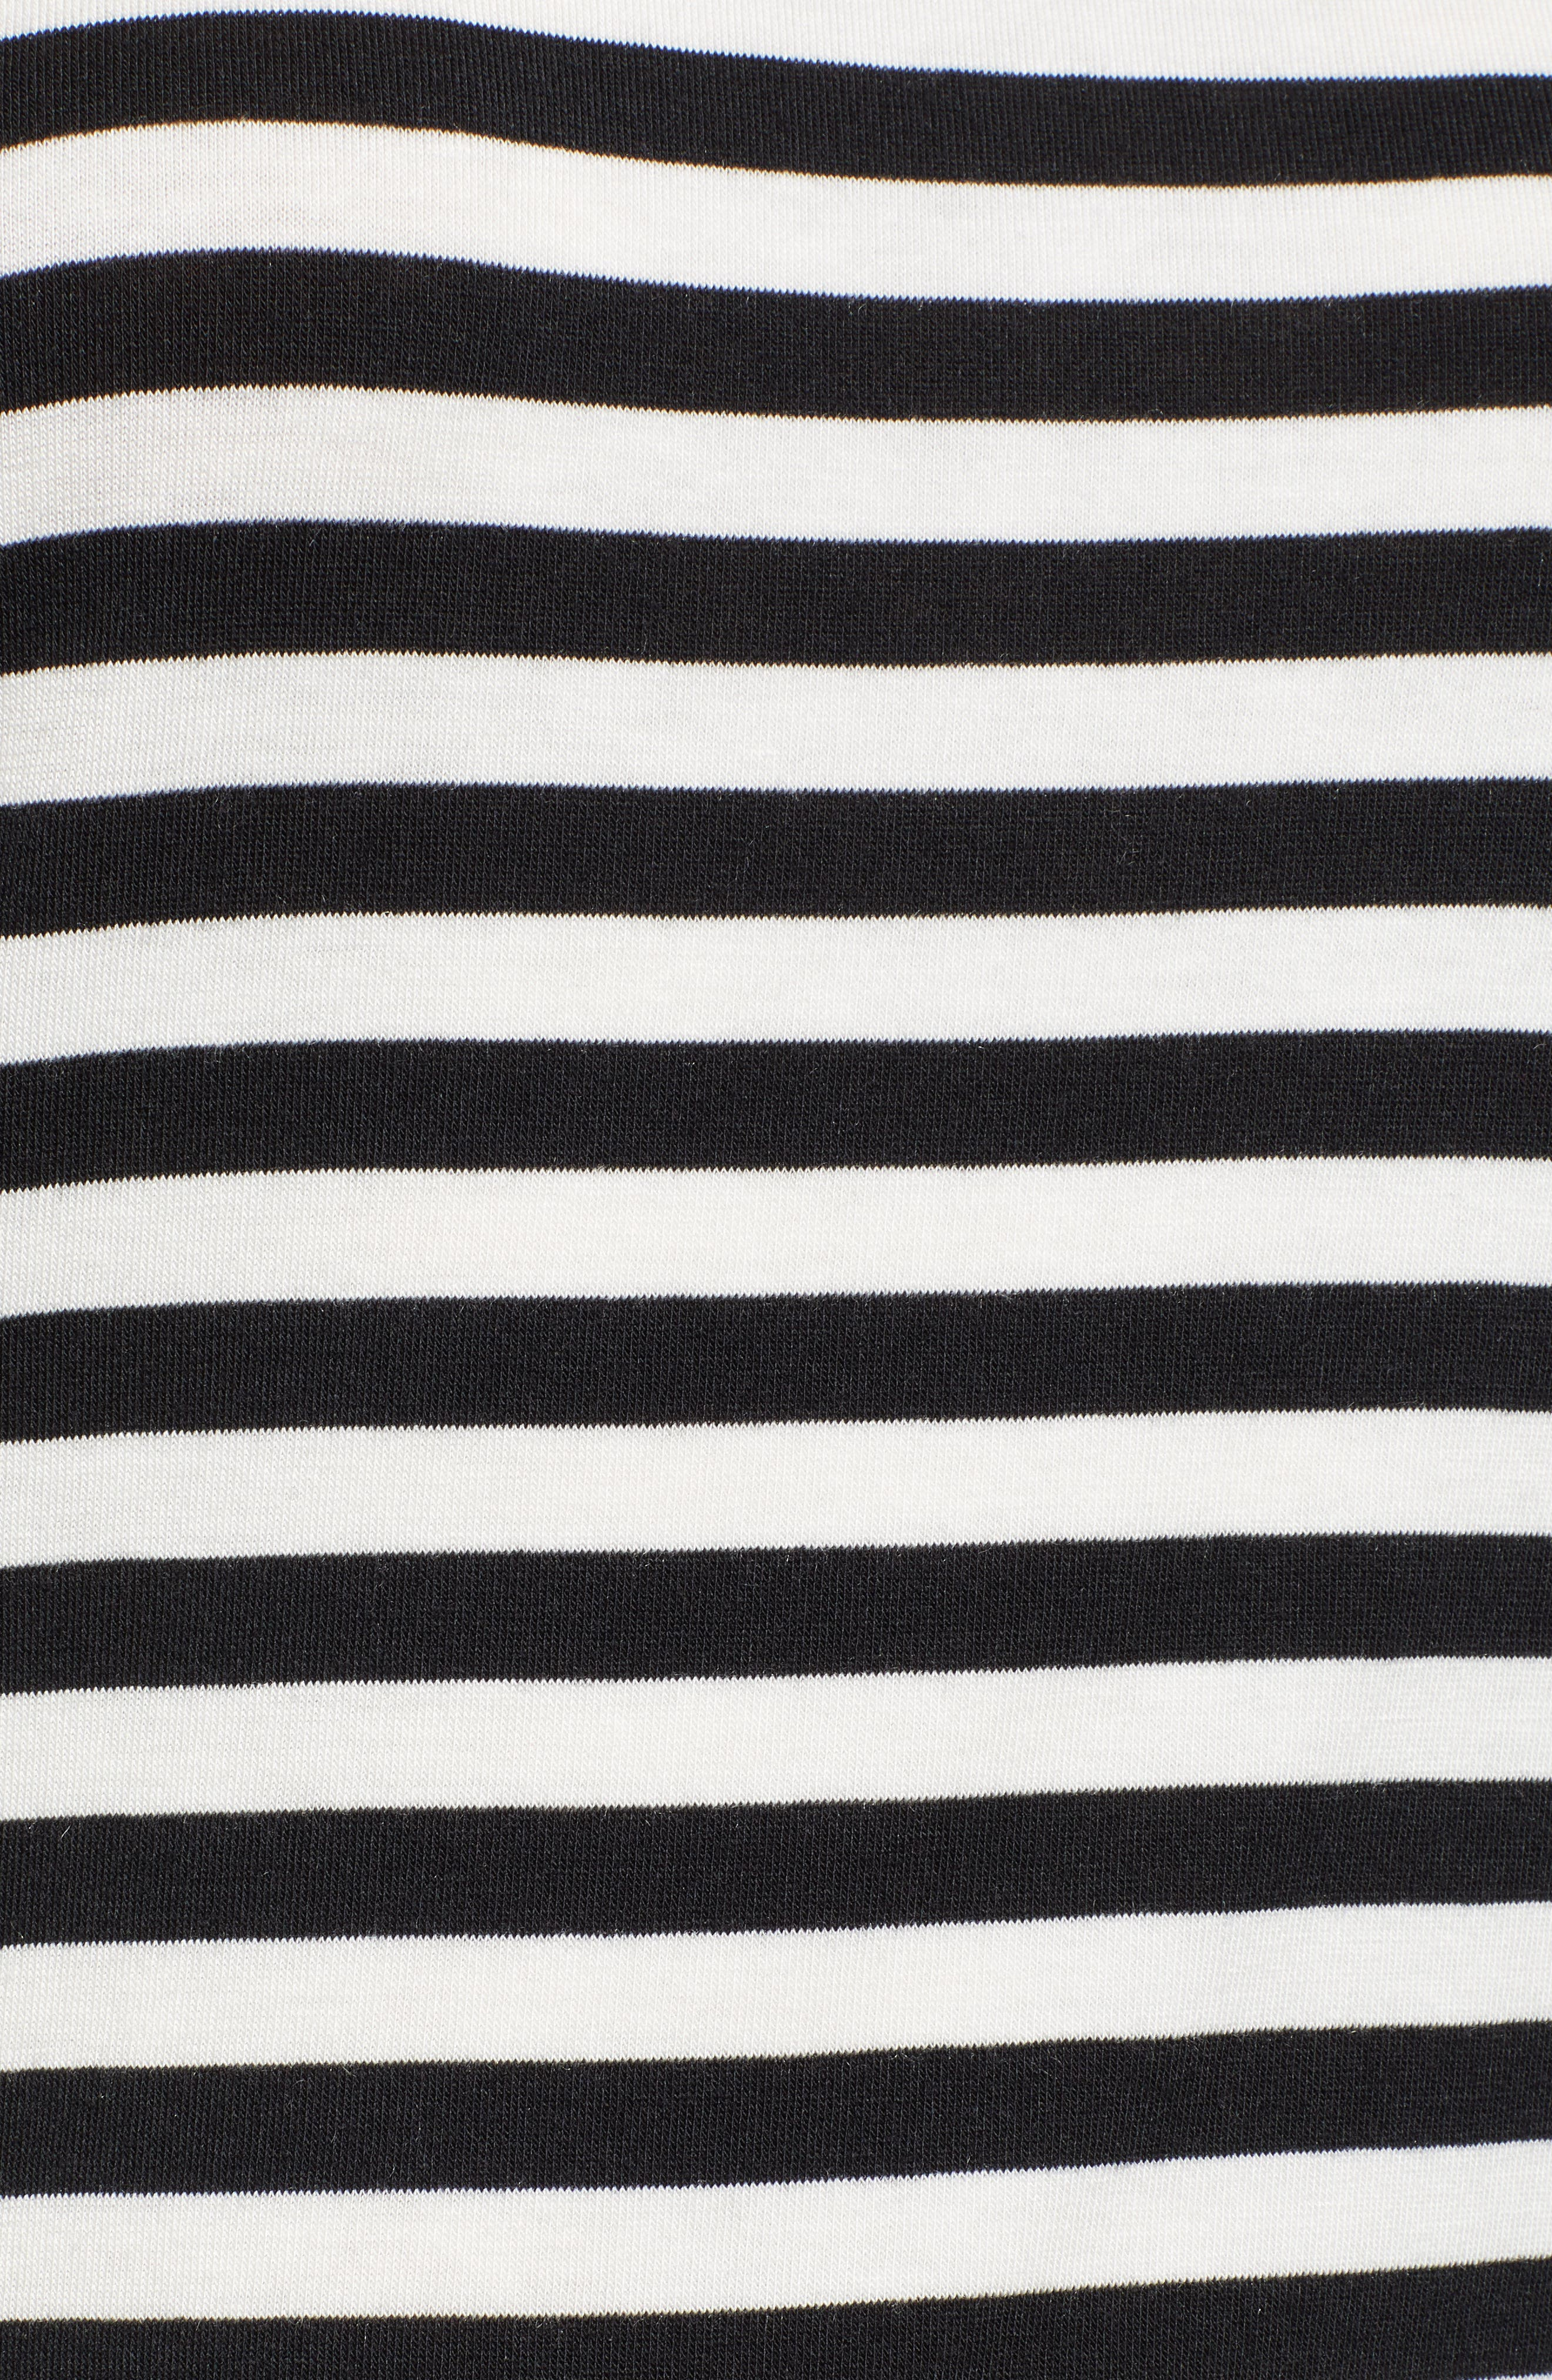 Stripe Jersey Turtleneck,                             Alternate thumbnail 5, color,                             002